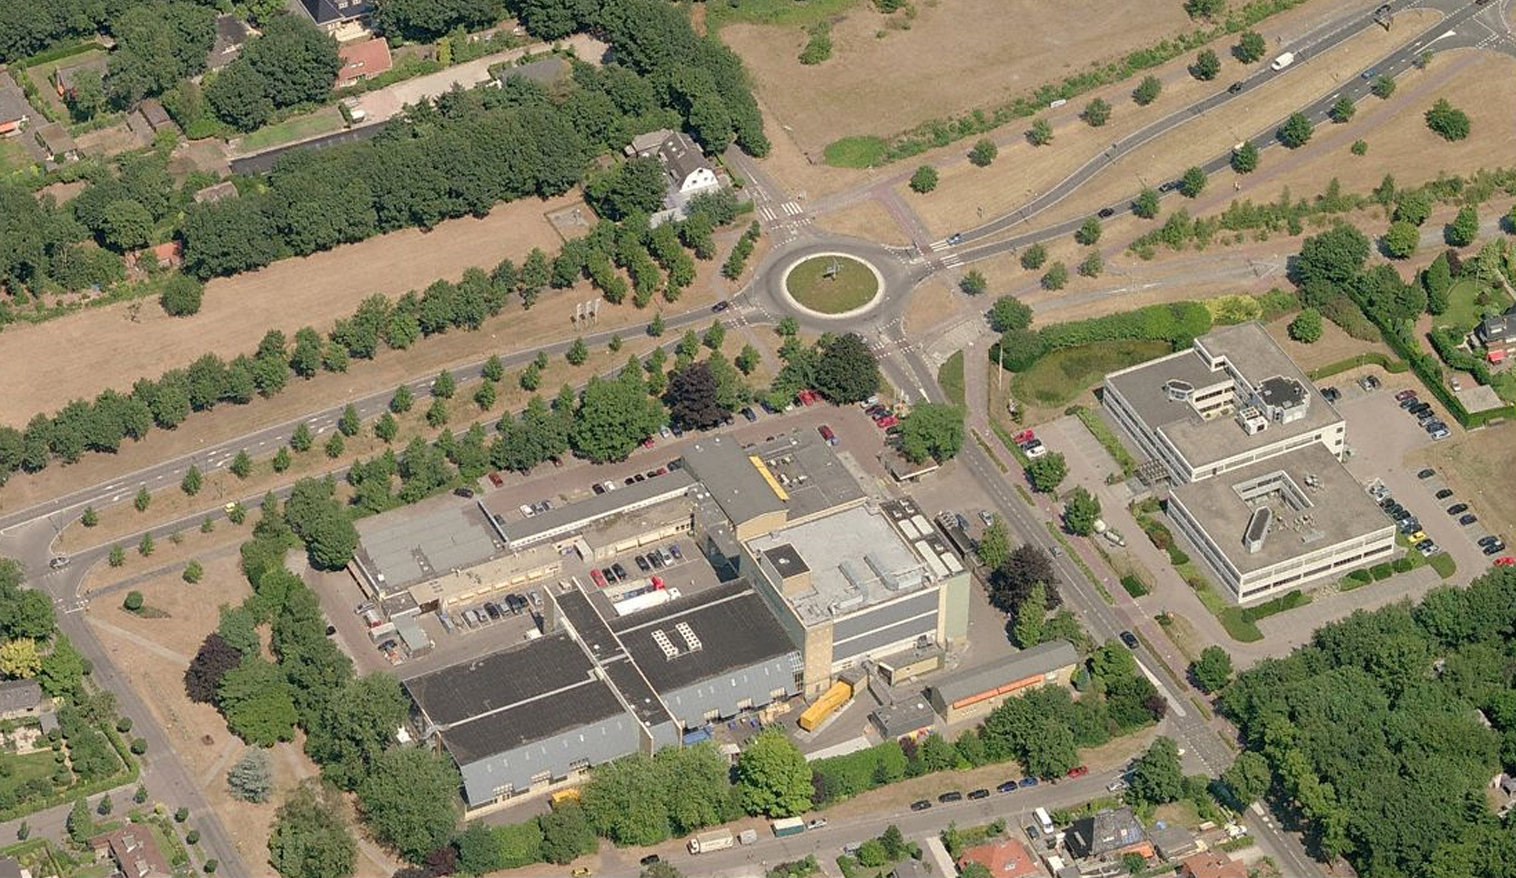 02 OPL Architecten_Knorr Loosdrecht-1516×878-72dpi